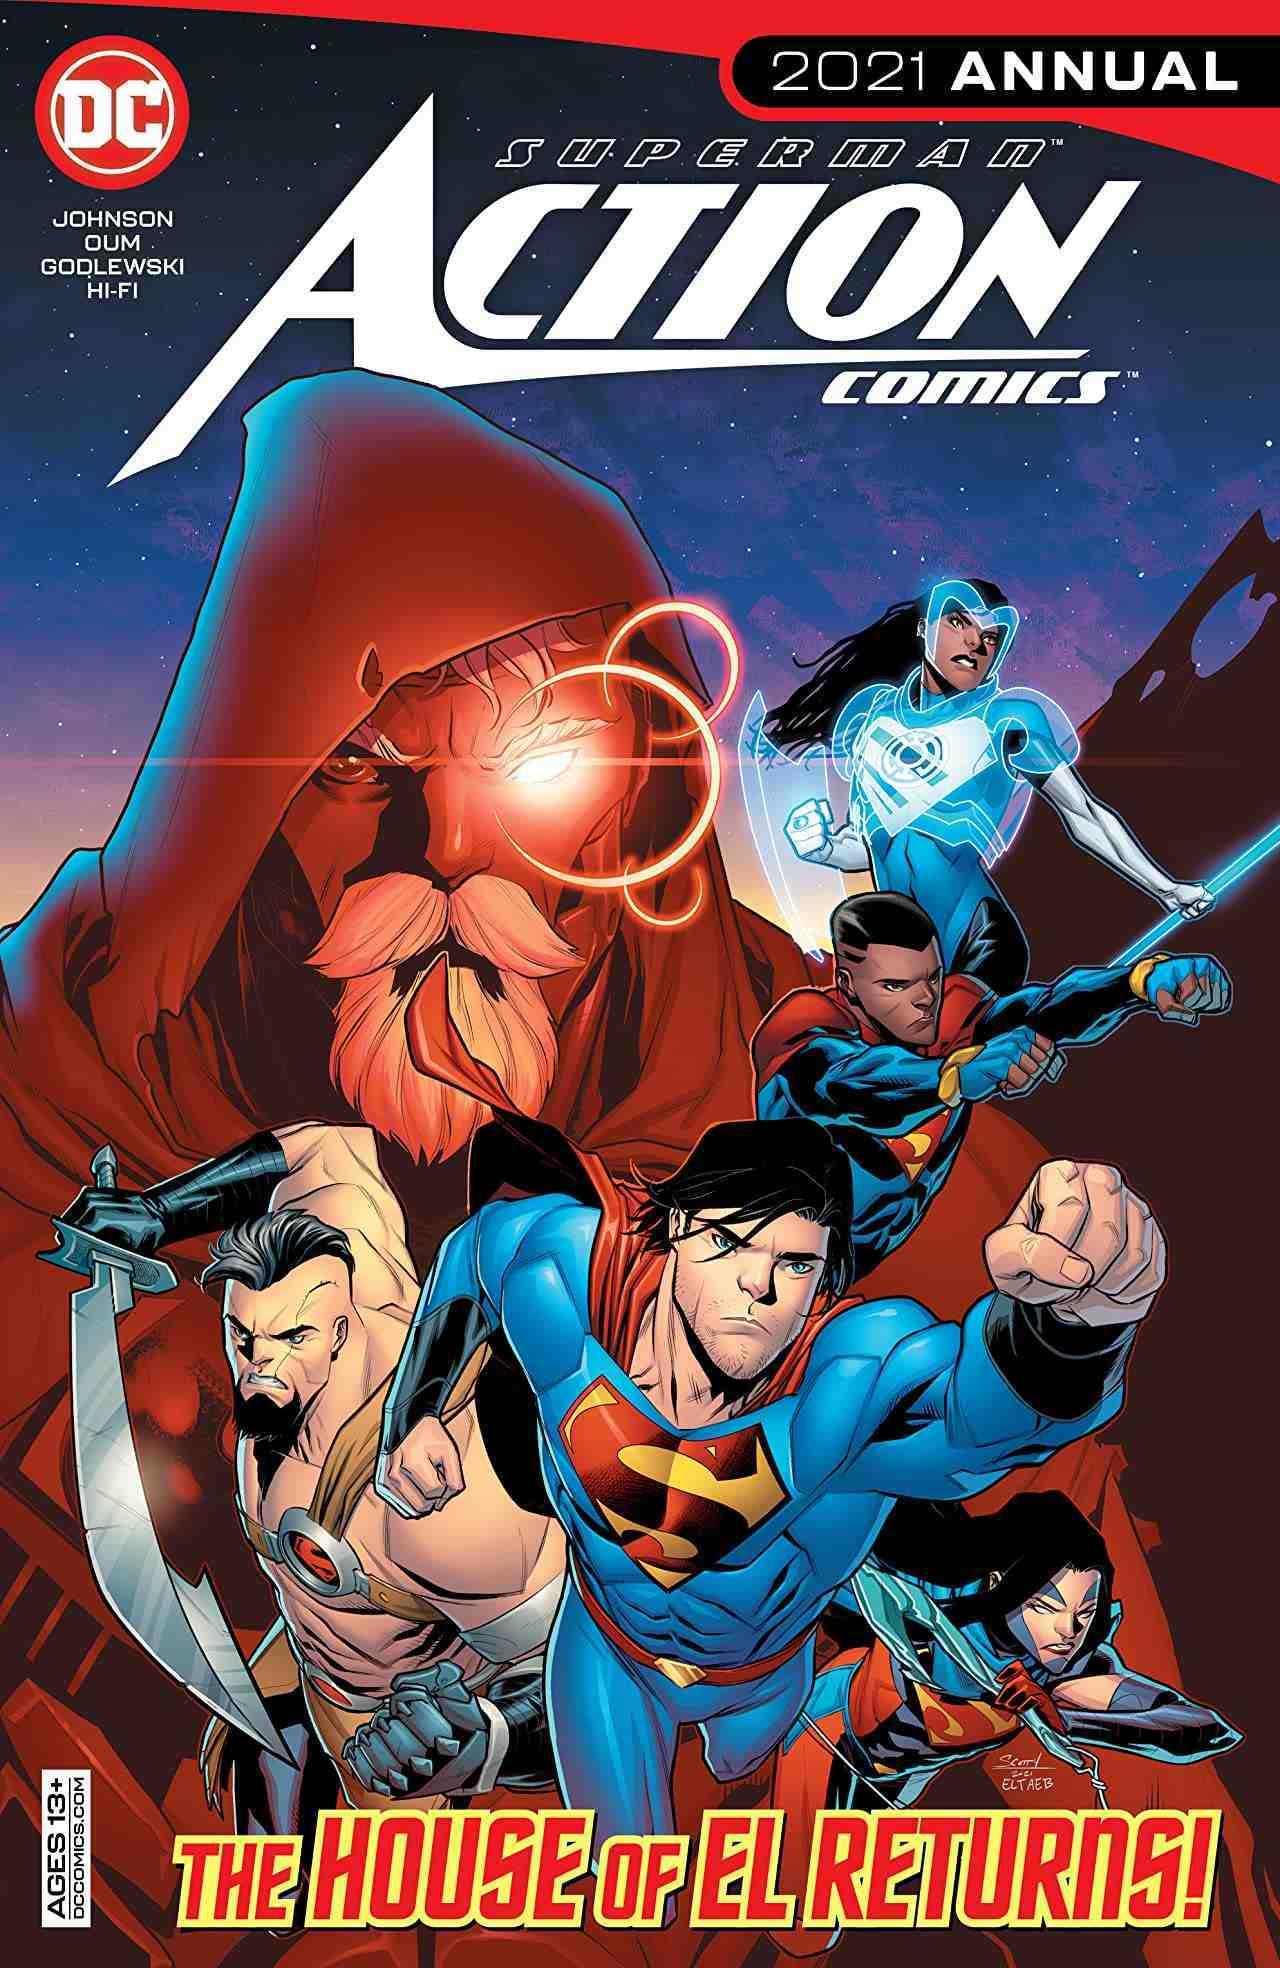 Action Comics Annual #1